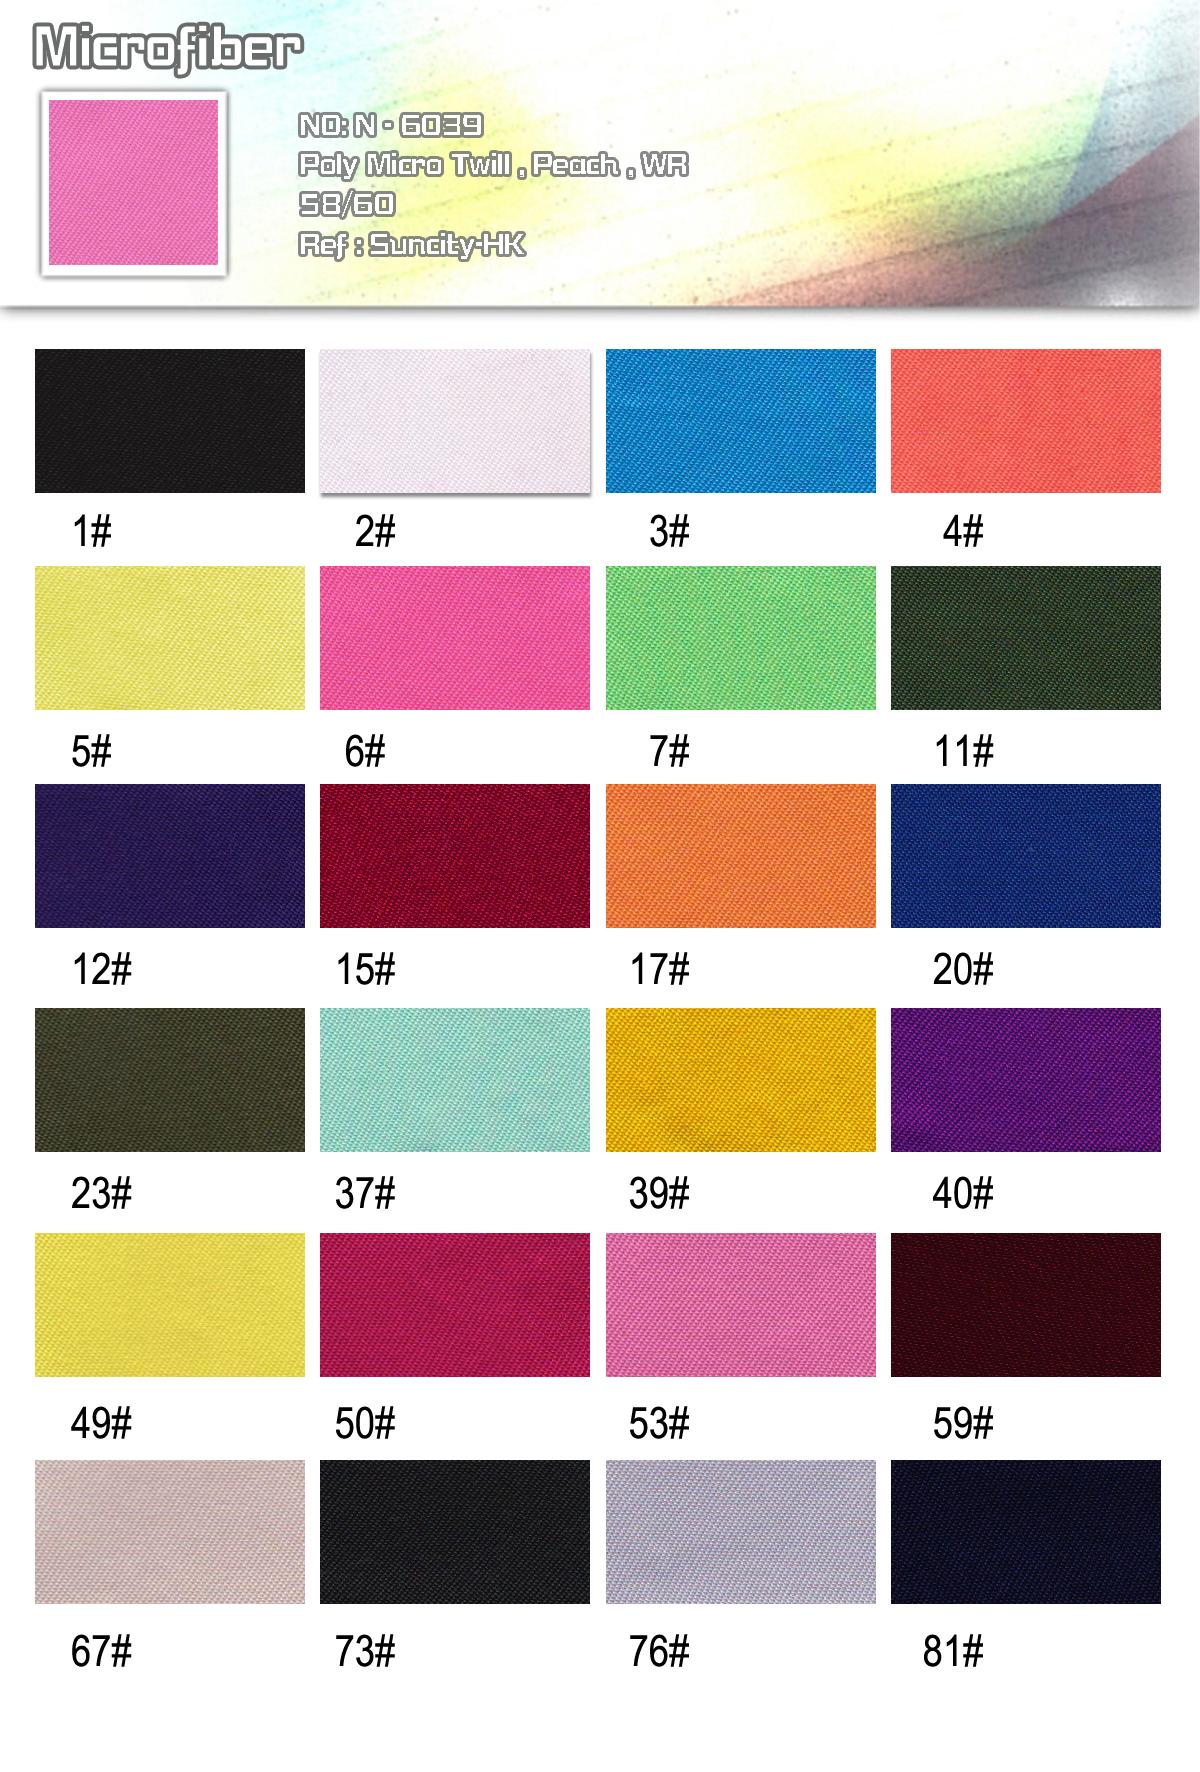 Fabric-Microfiber-100%-polyester-twill-Jacket-20090714